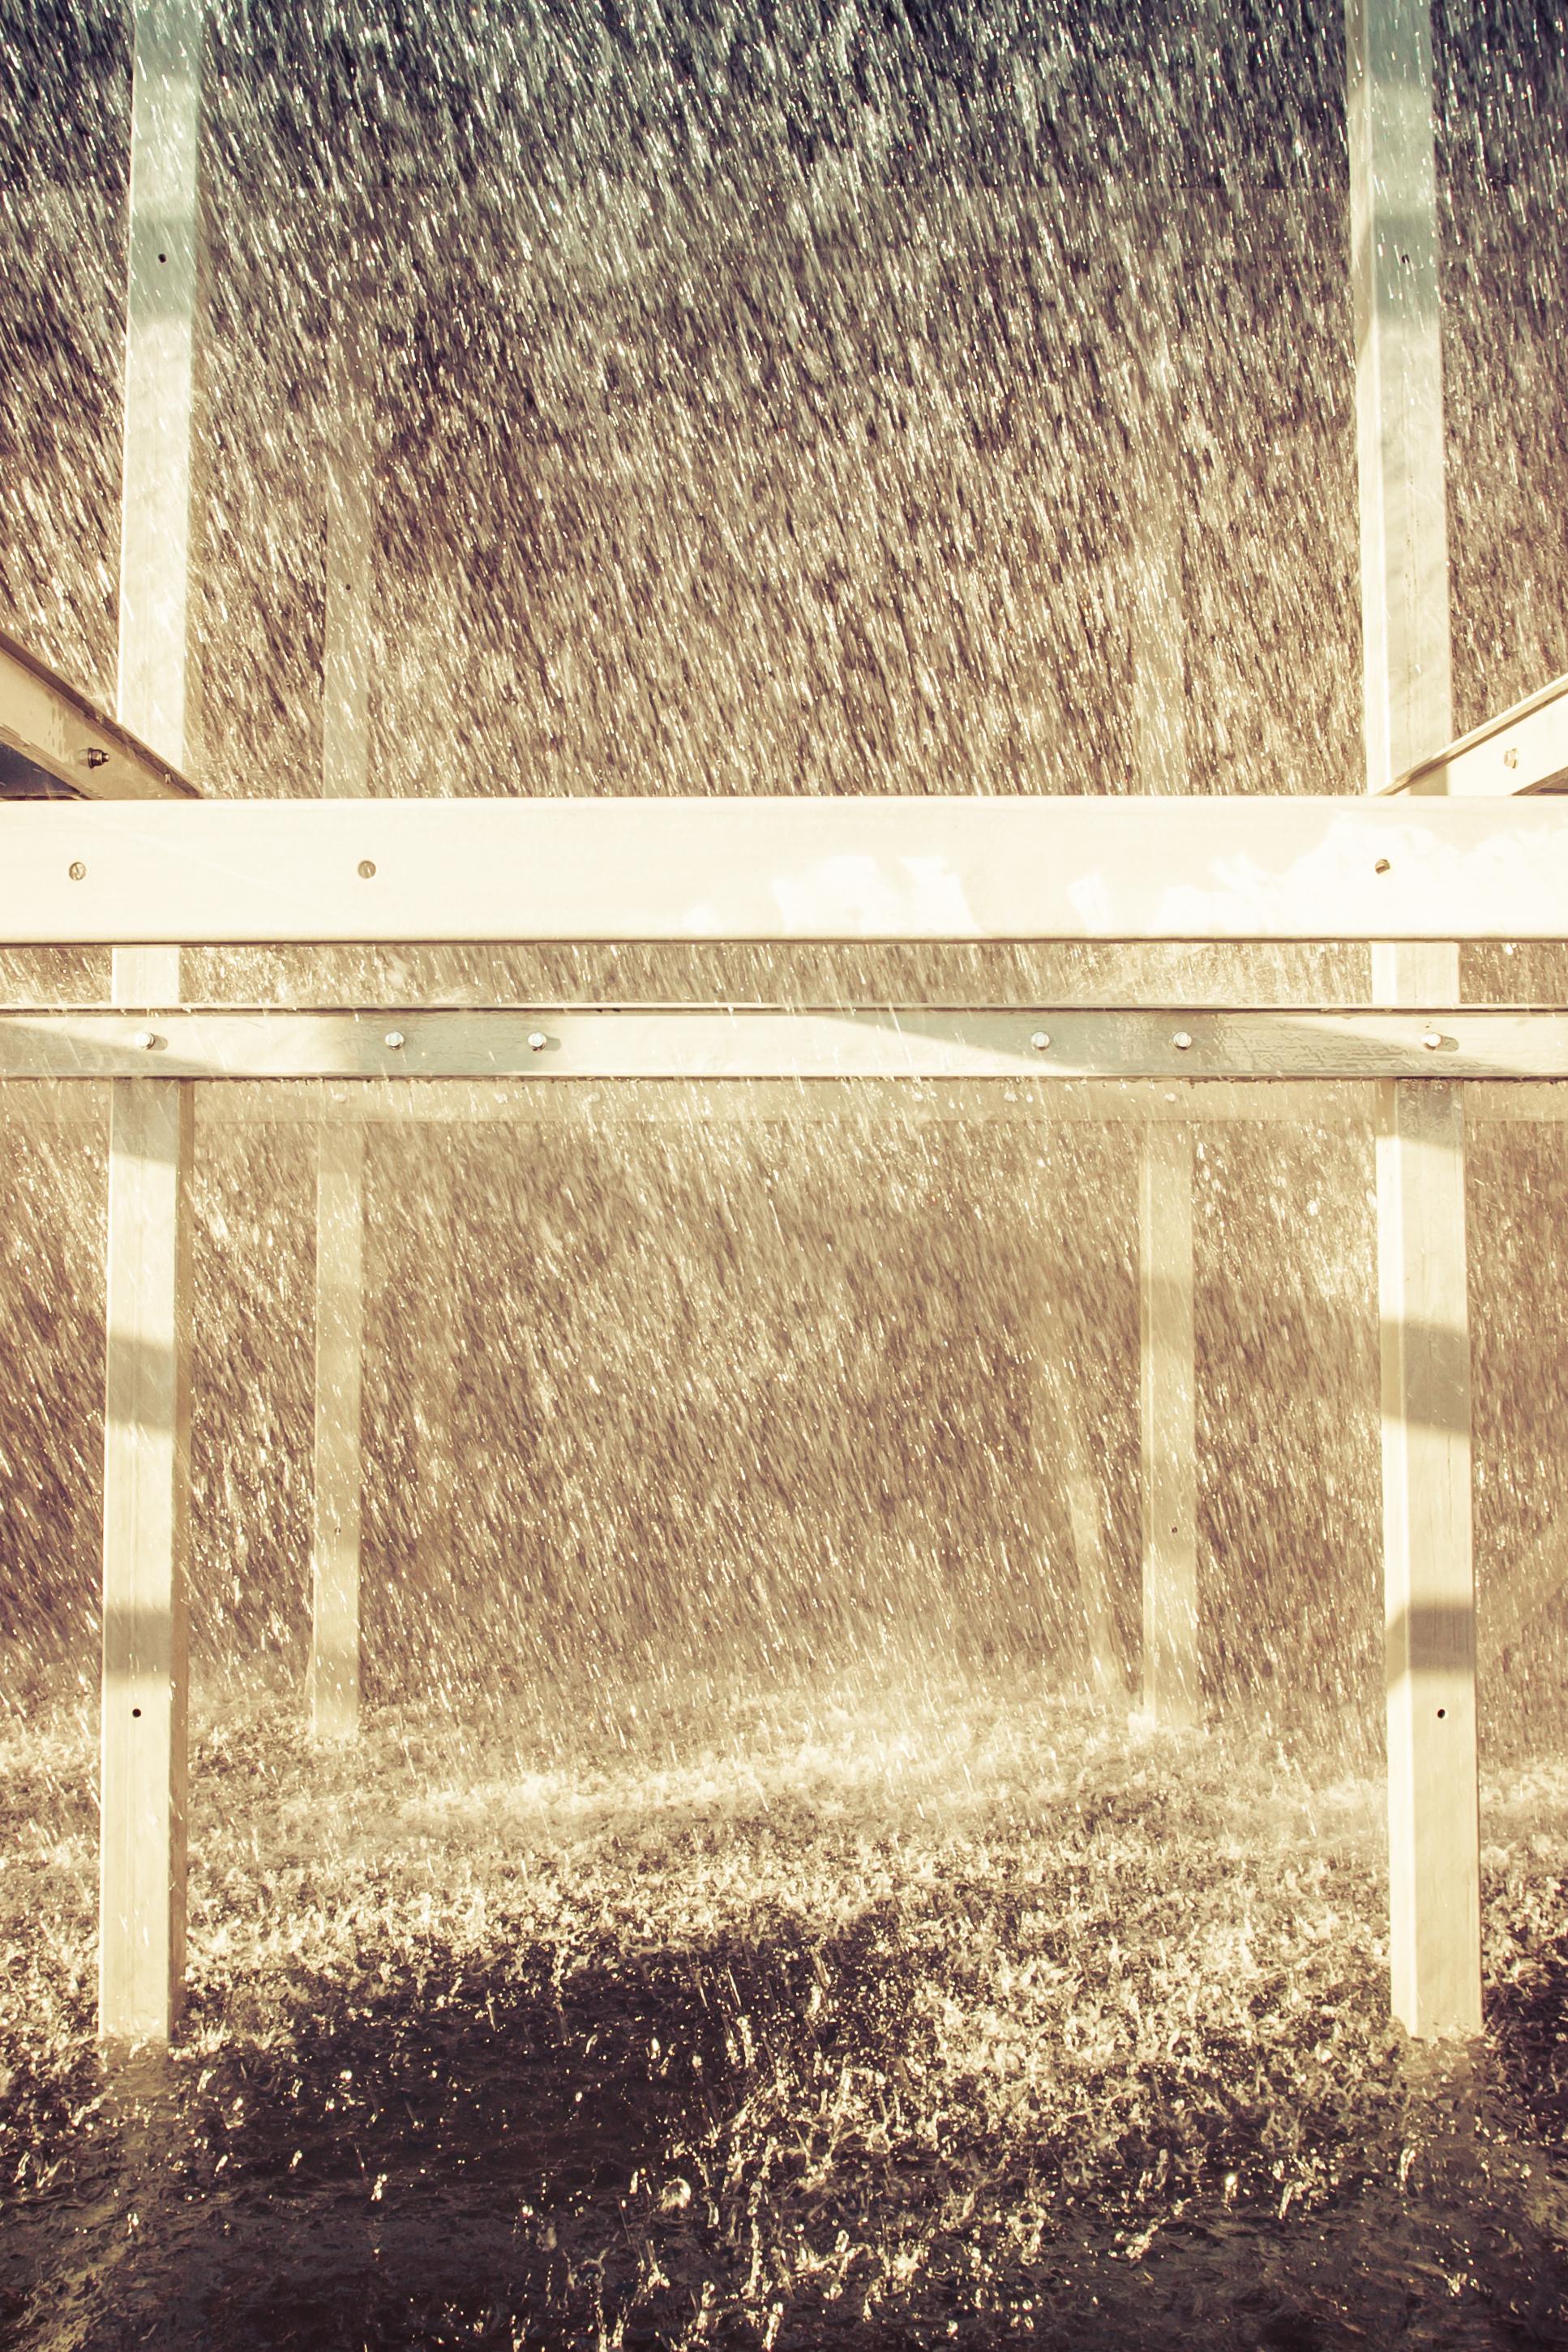 Falling Water Texture, Drops, Falling, Liquid, Splash, HQ Photo